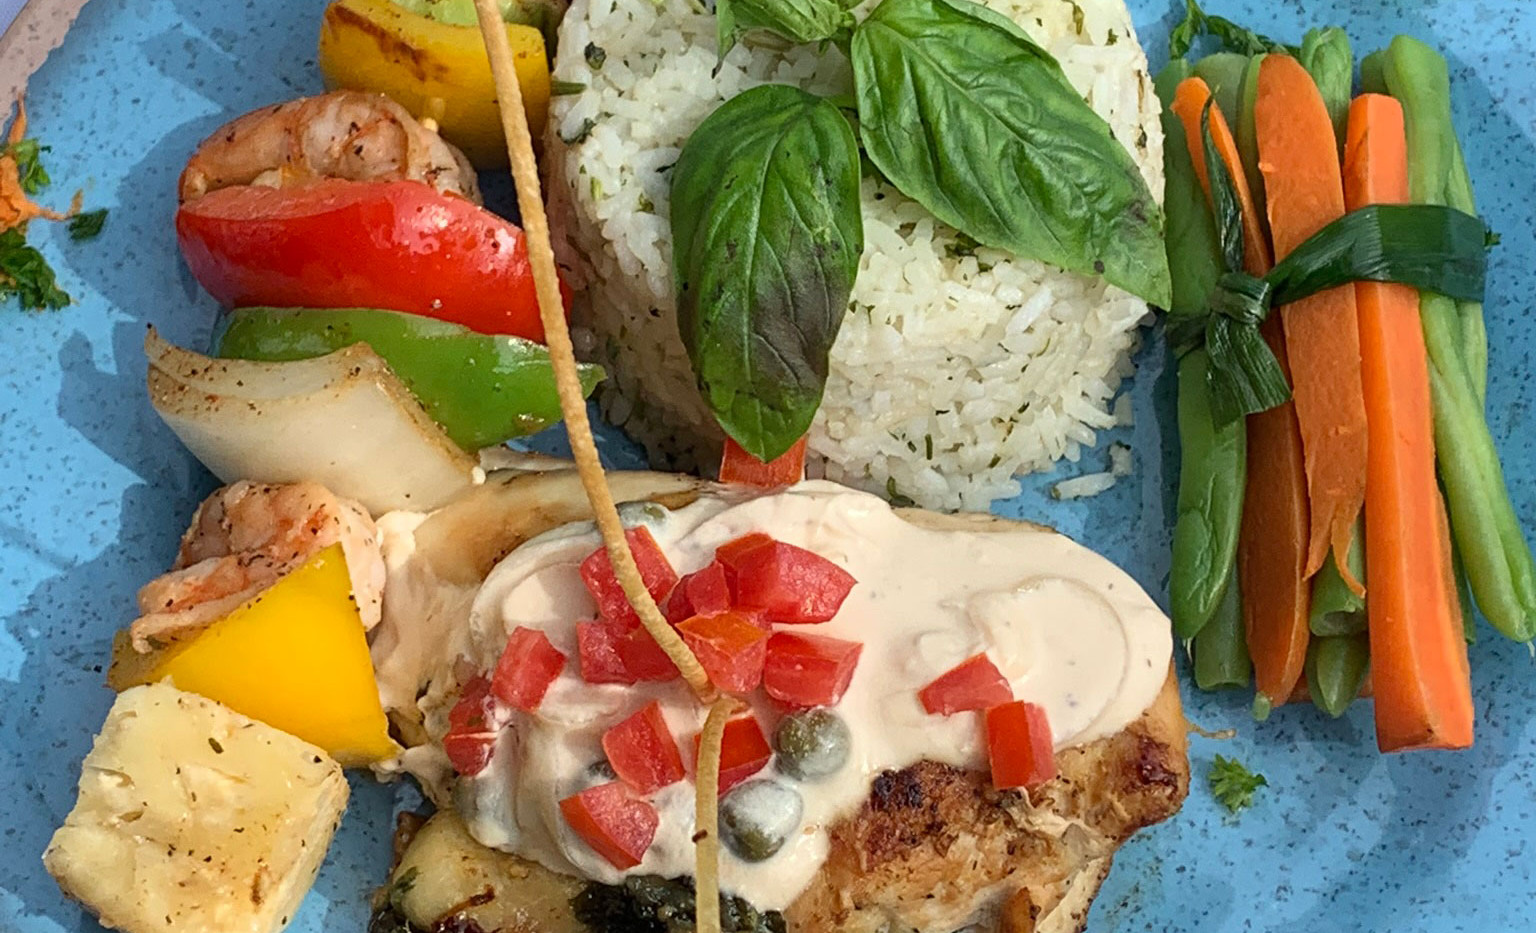 Spinach stuffed chicken, Caribbean shrimp kebob, cilantro rice